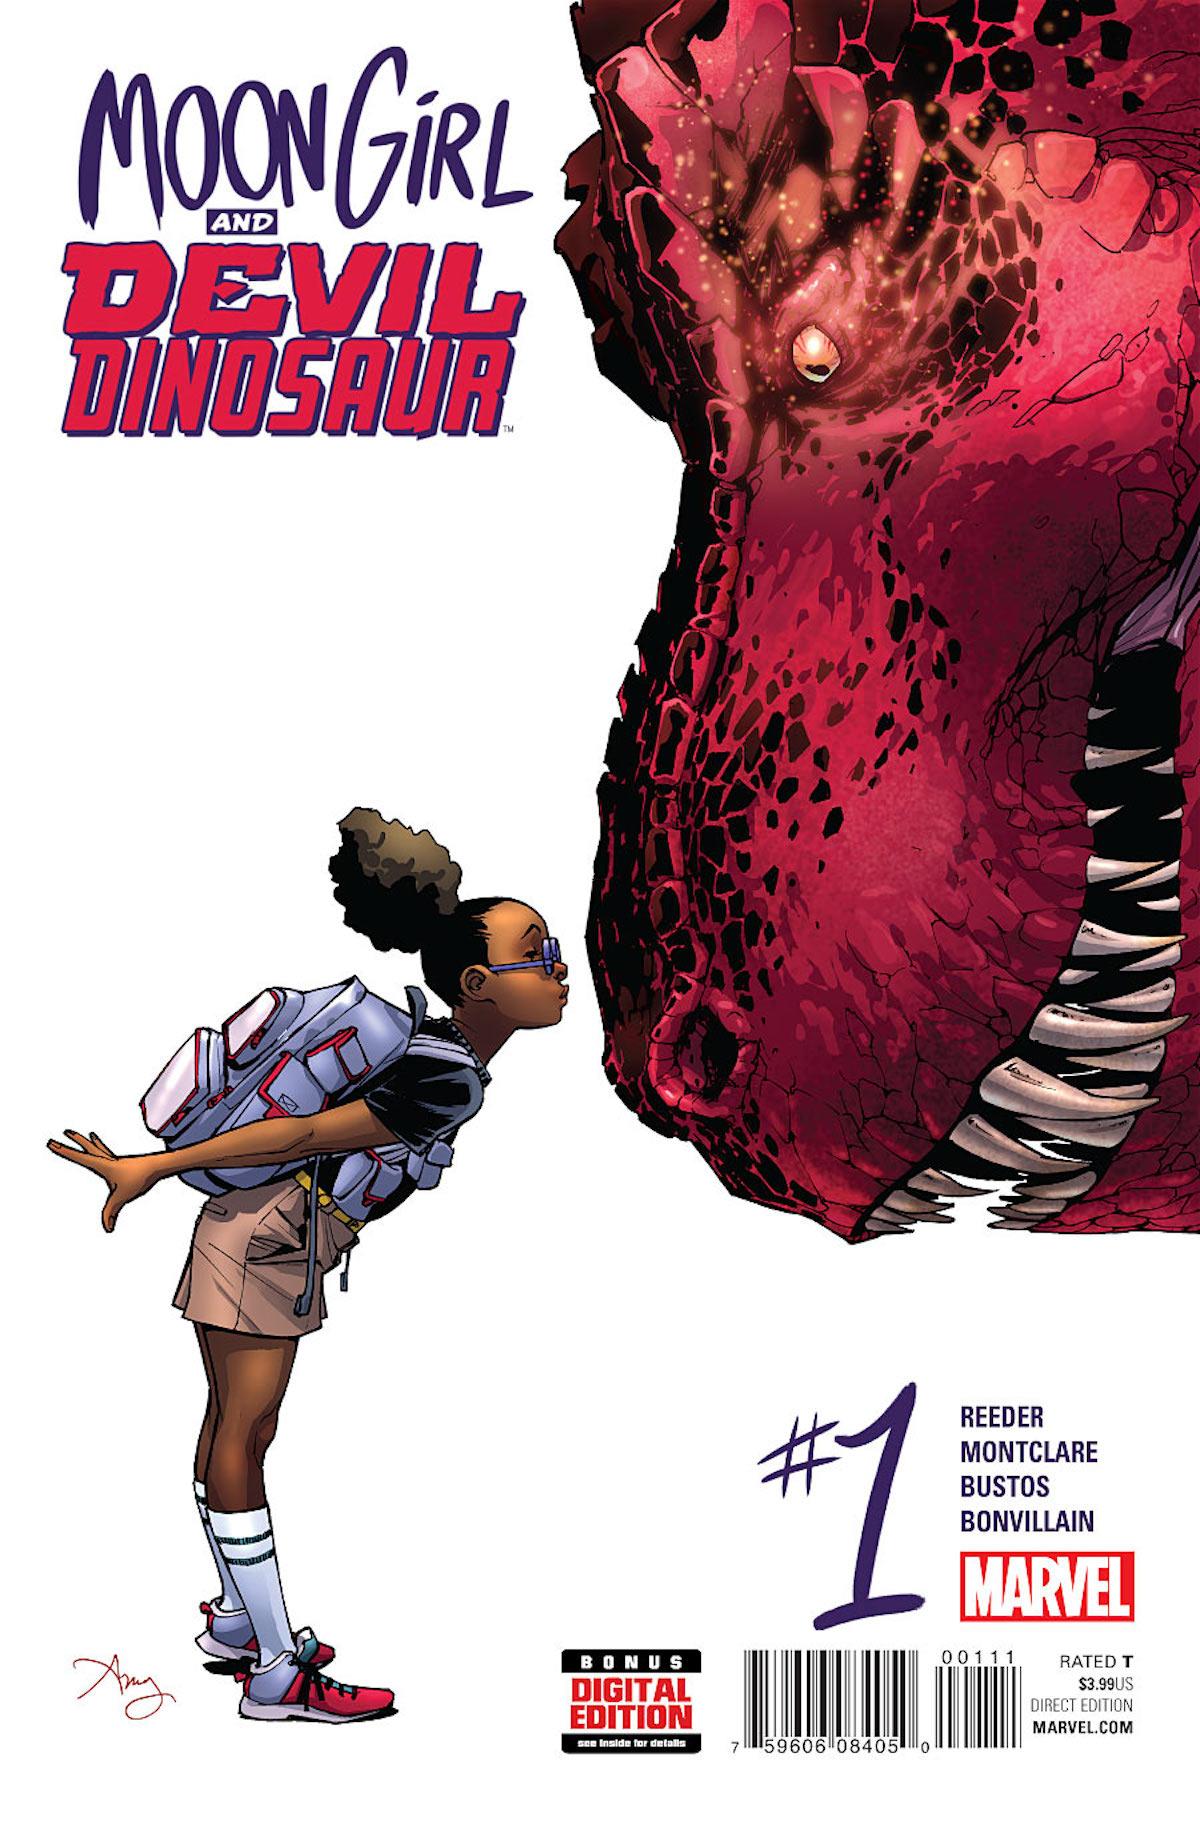 Moon Girl and Devil Dinosaur, African American Literature, Black Literature, KOLUMN Magazine, KOLUMN